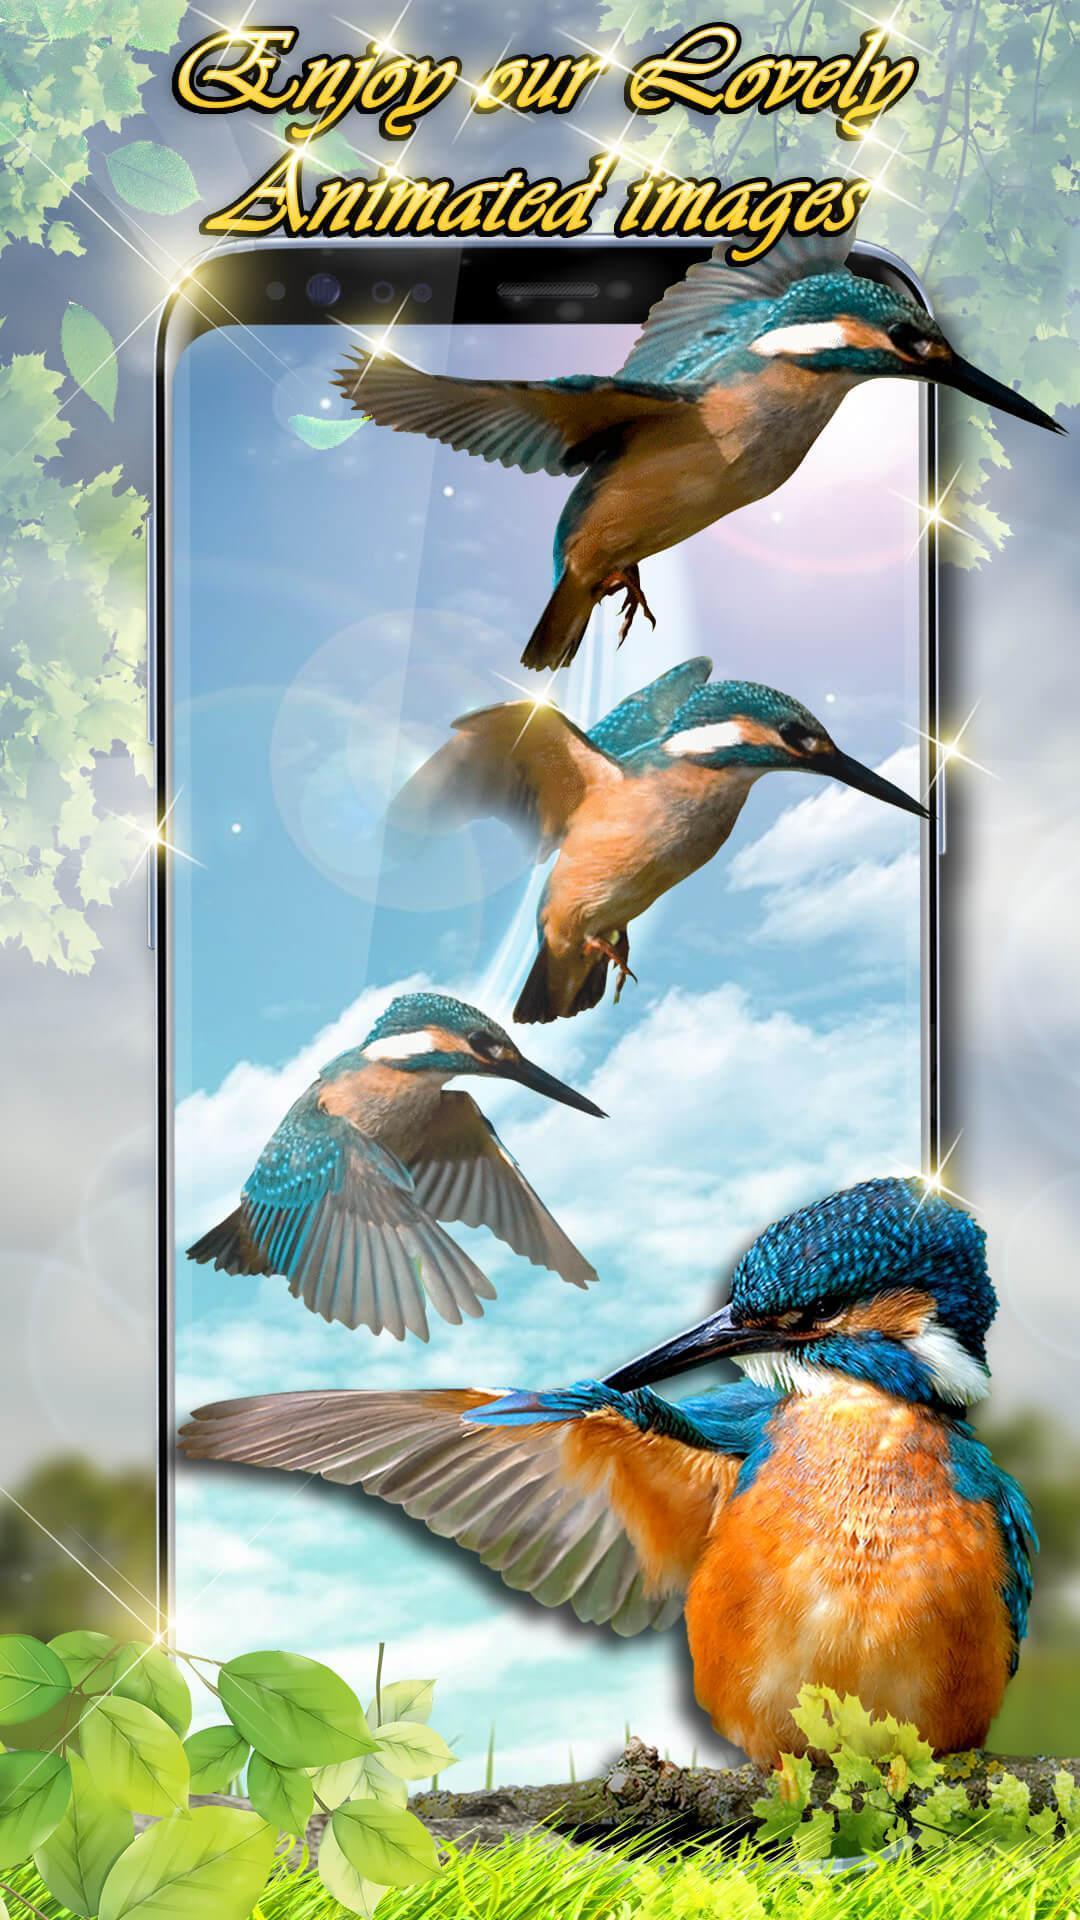 Wallpaper Suara Burung Hidup 🐦 Gambar Animasi For Android